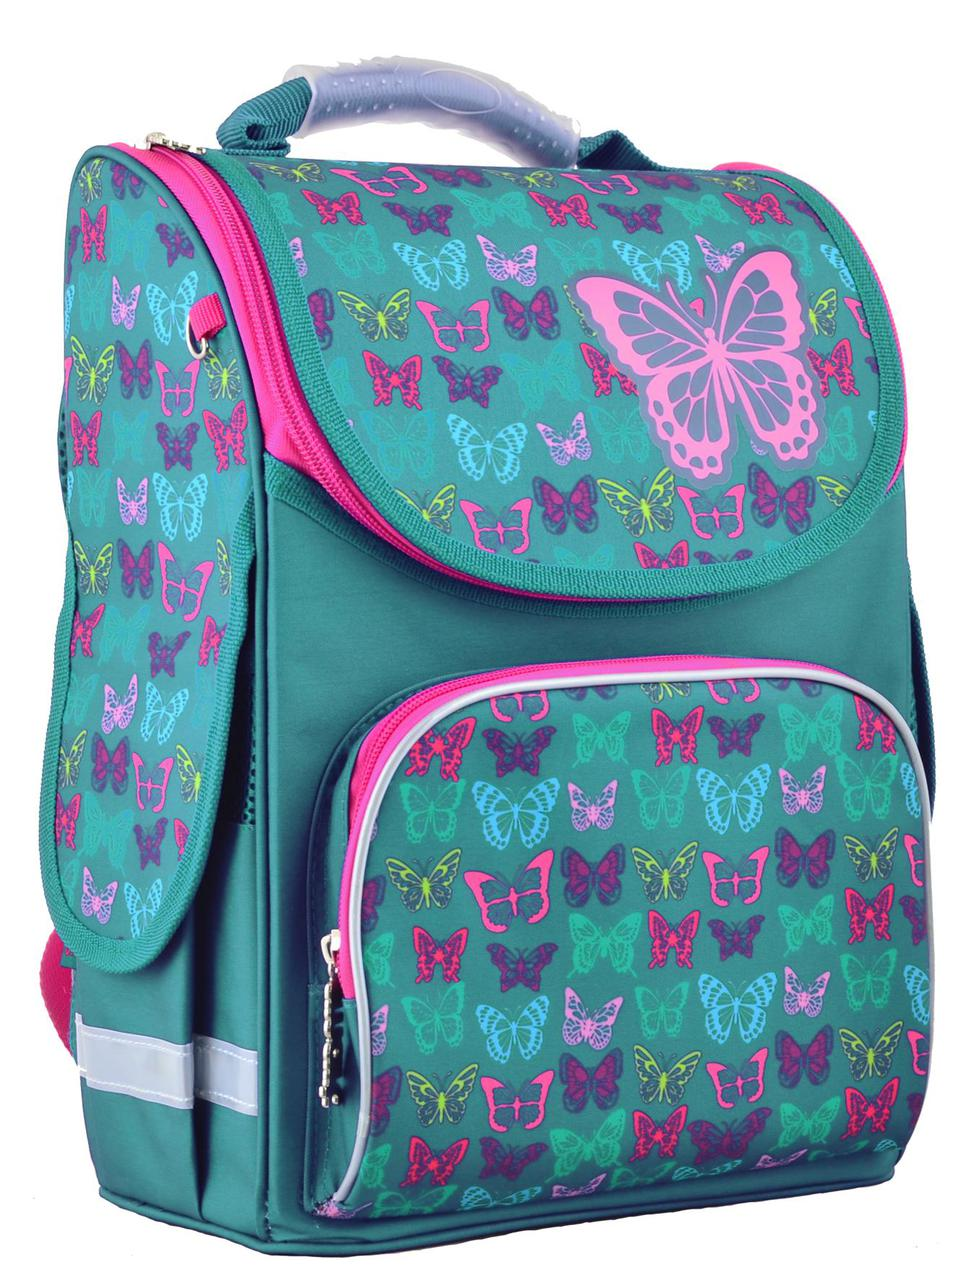 Рюкзак каркасный, Butterfly turquoise, 34*26*14 см, PG-11, Smart, 554449